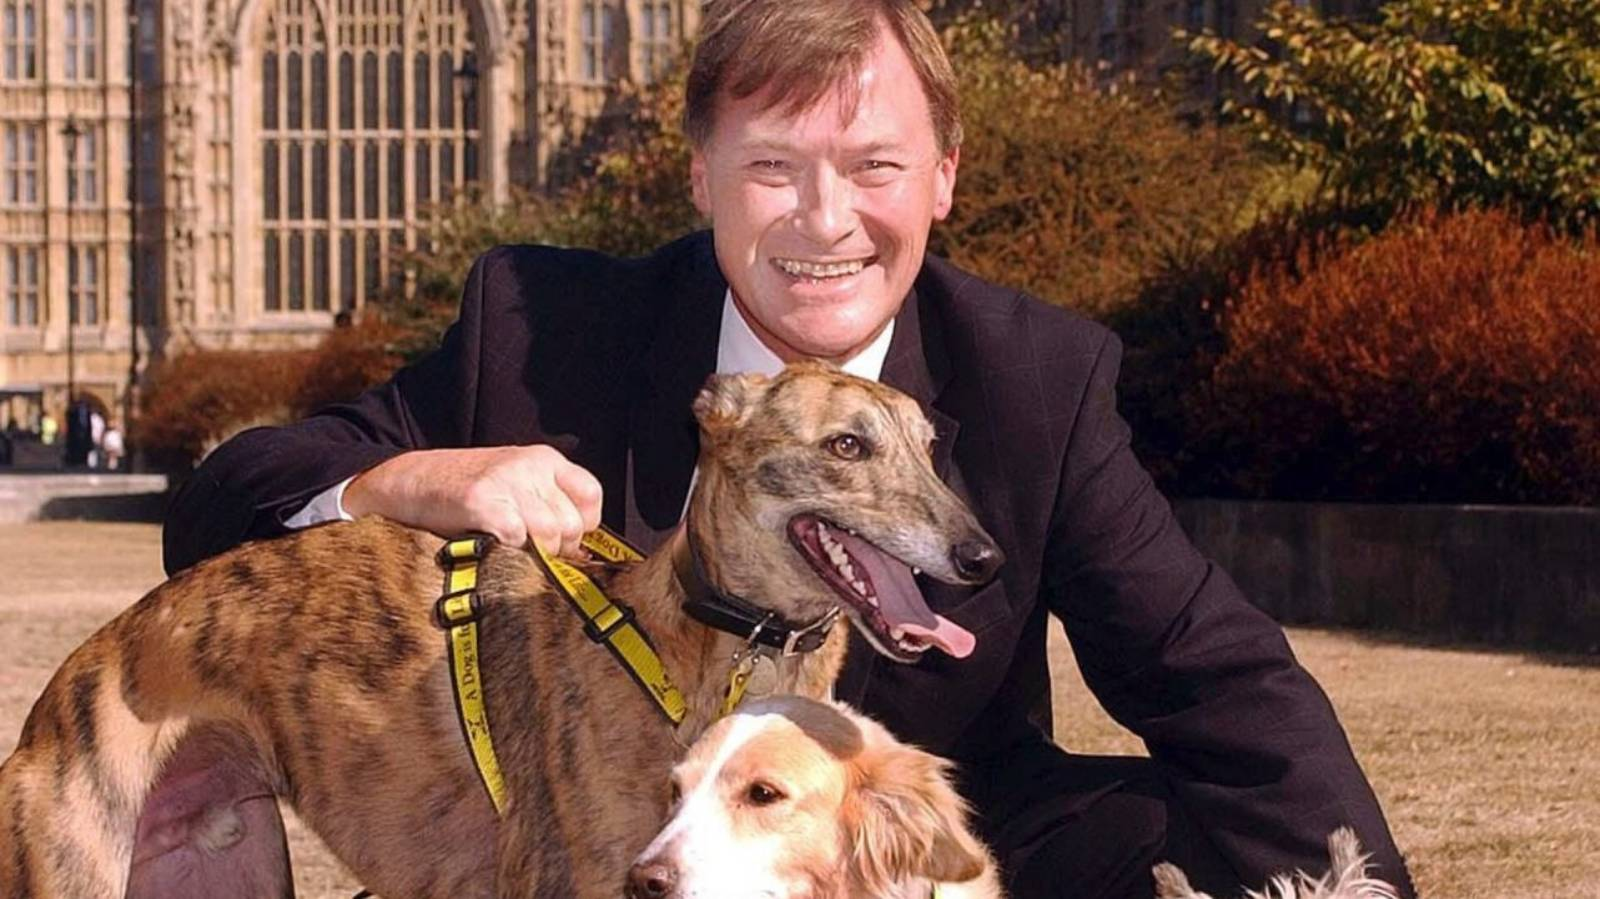 Stabbing death of UK MP David Amess declared a terrorist incident